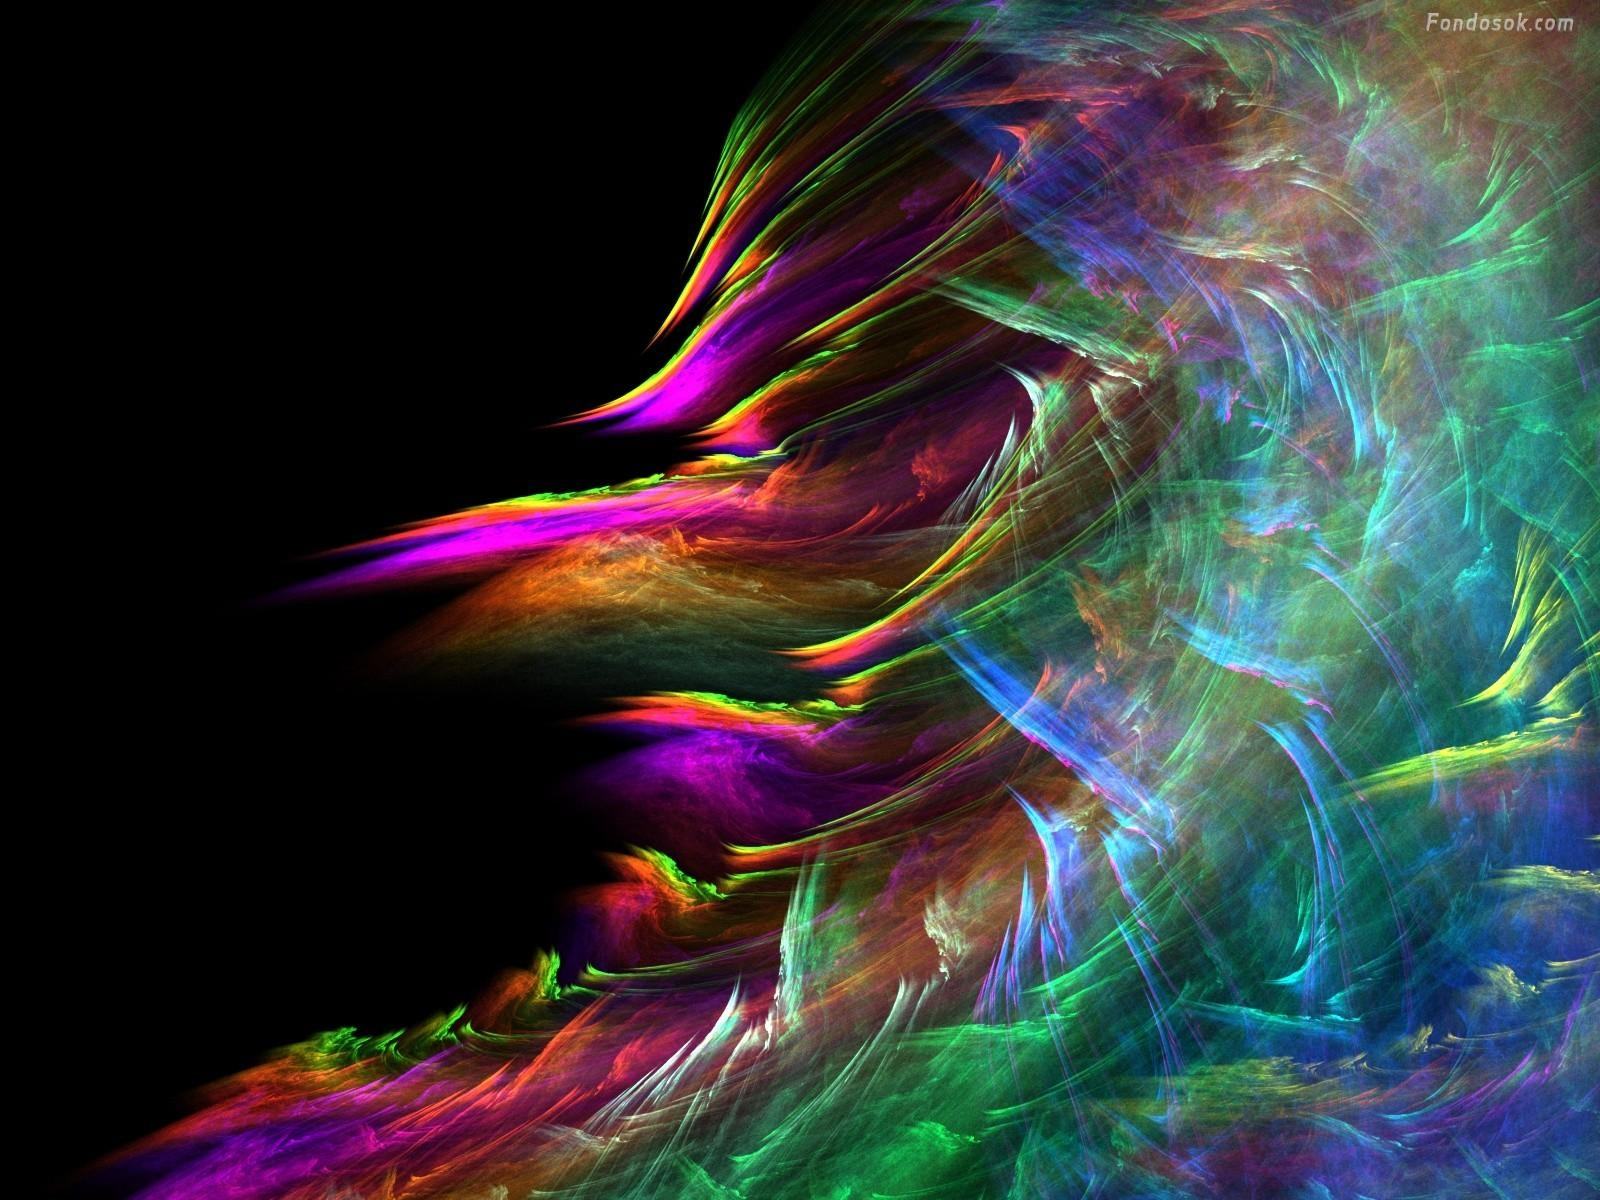 fondo-colores-de-arcoiris-869 (1) – EL LENGUAJE DEL ADIÓS…